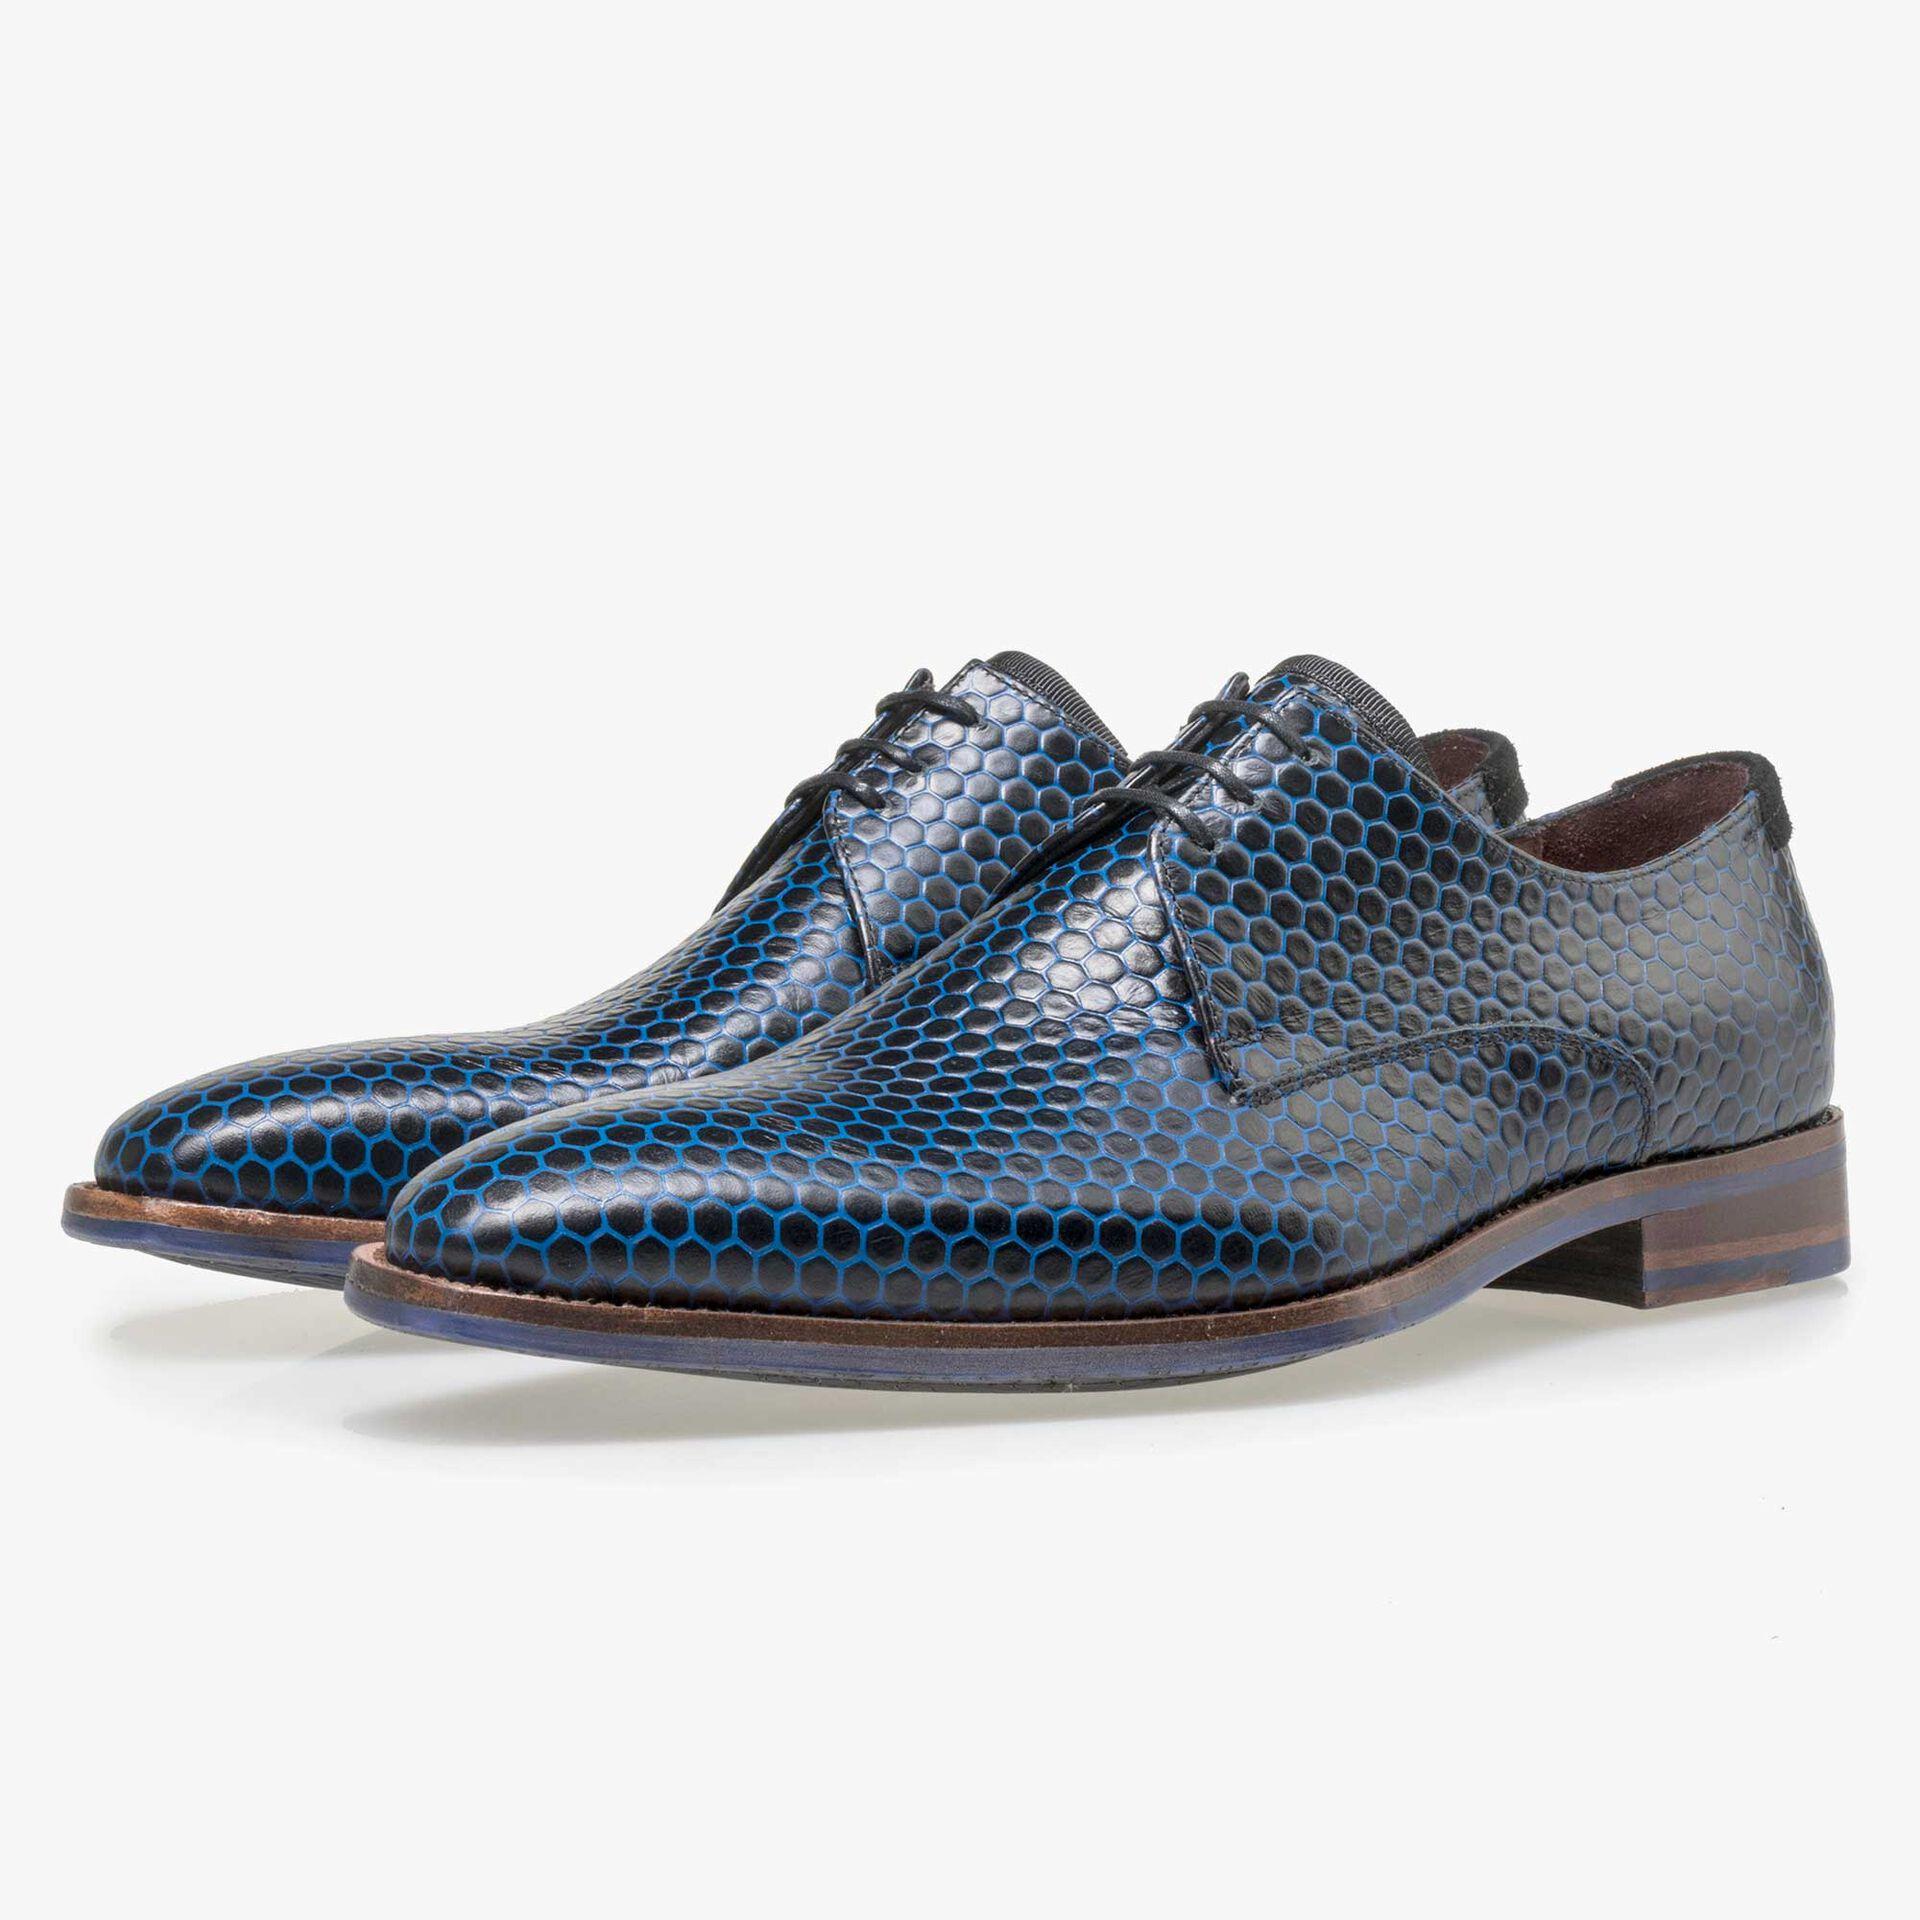 Floris van Bommel black calf's leather lace shoe finished with blue hexagon print